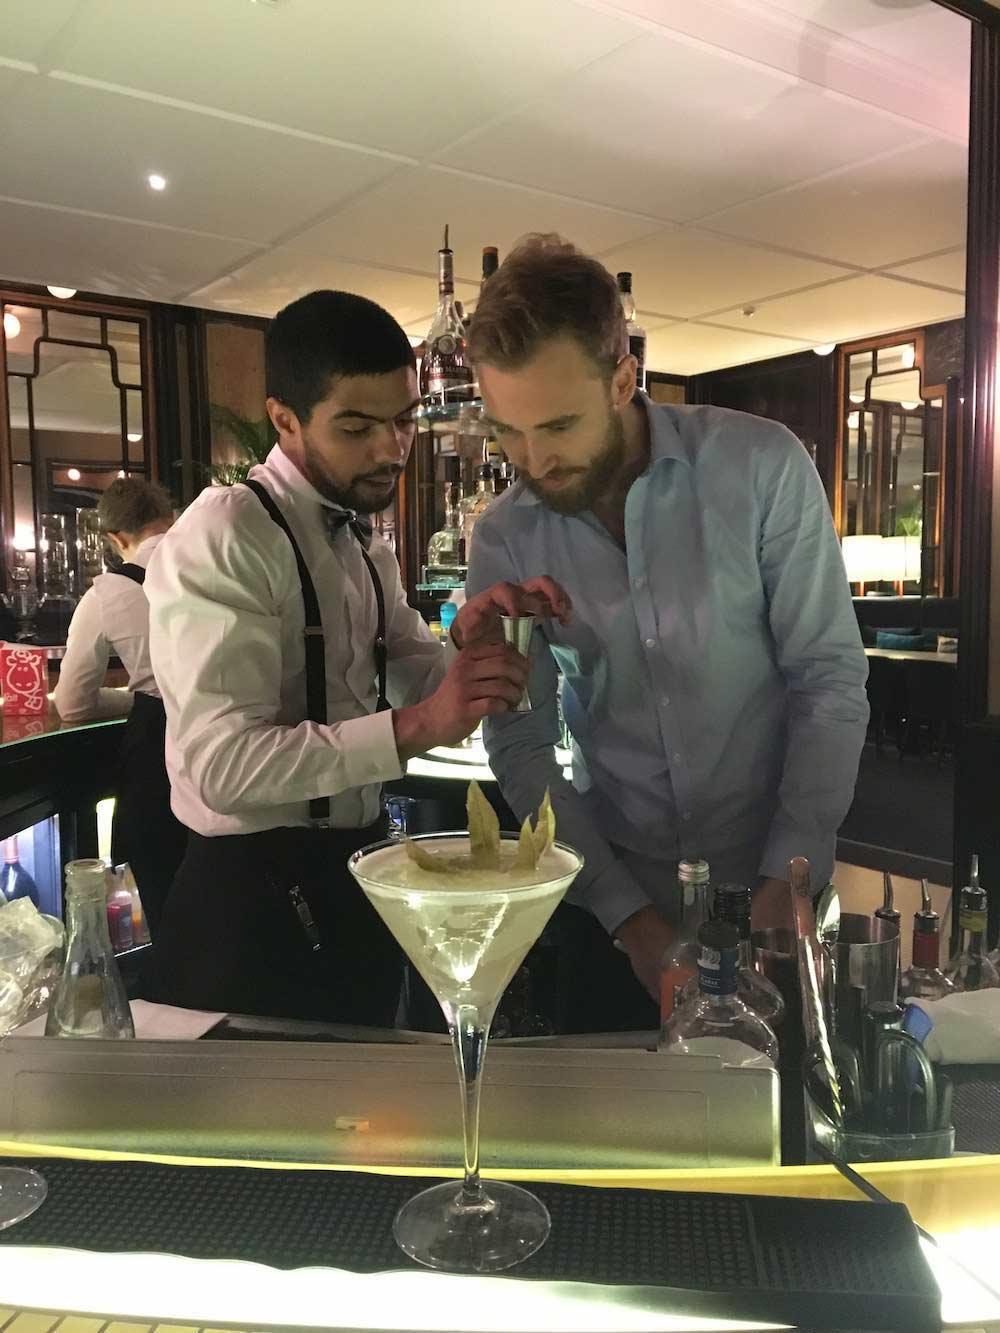 avis staycation hotel l'echiquier opéra mixologie cours cocktails